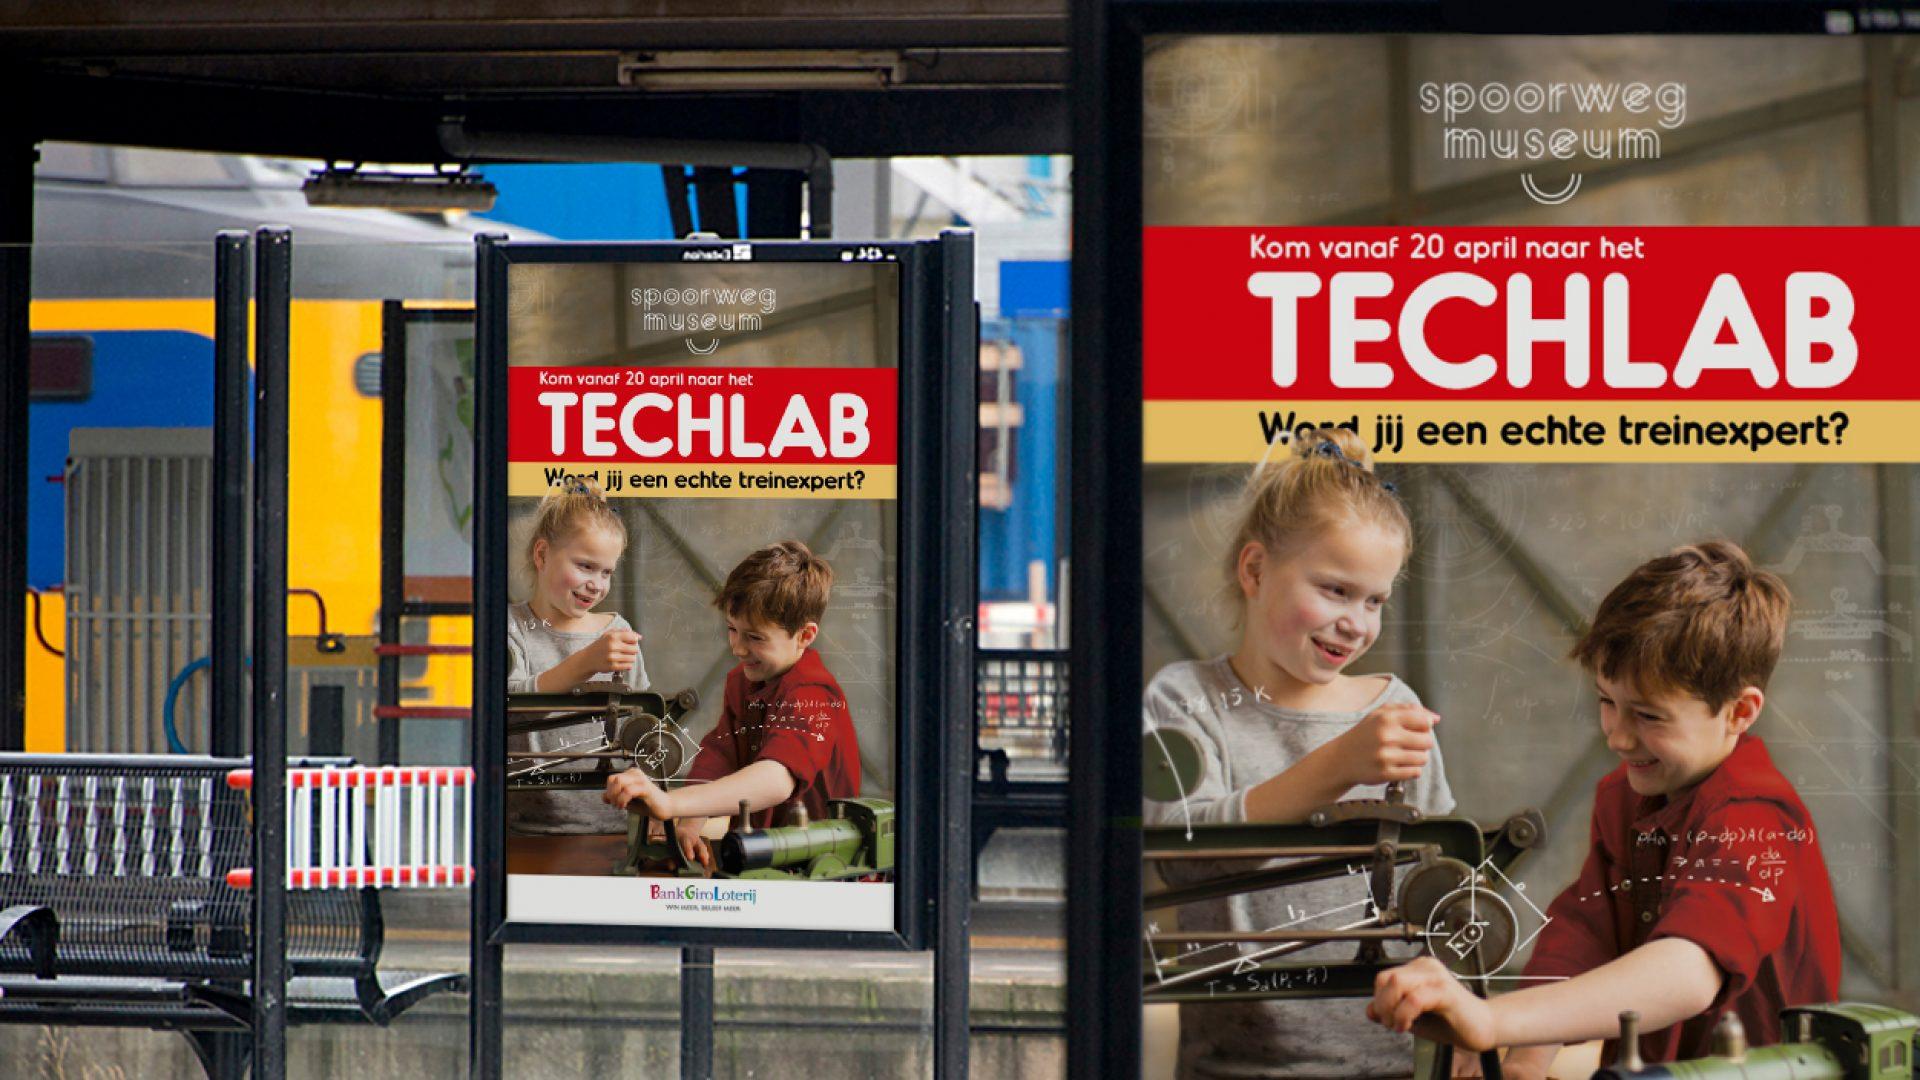 Spooerwegmuseum_Techlab